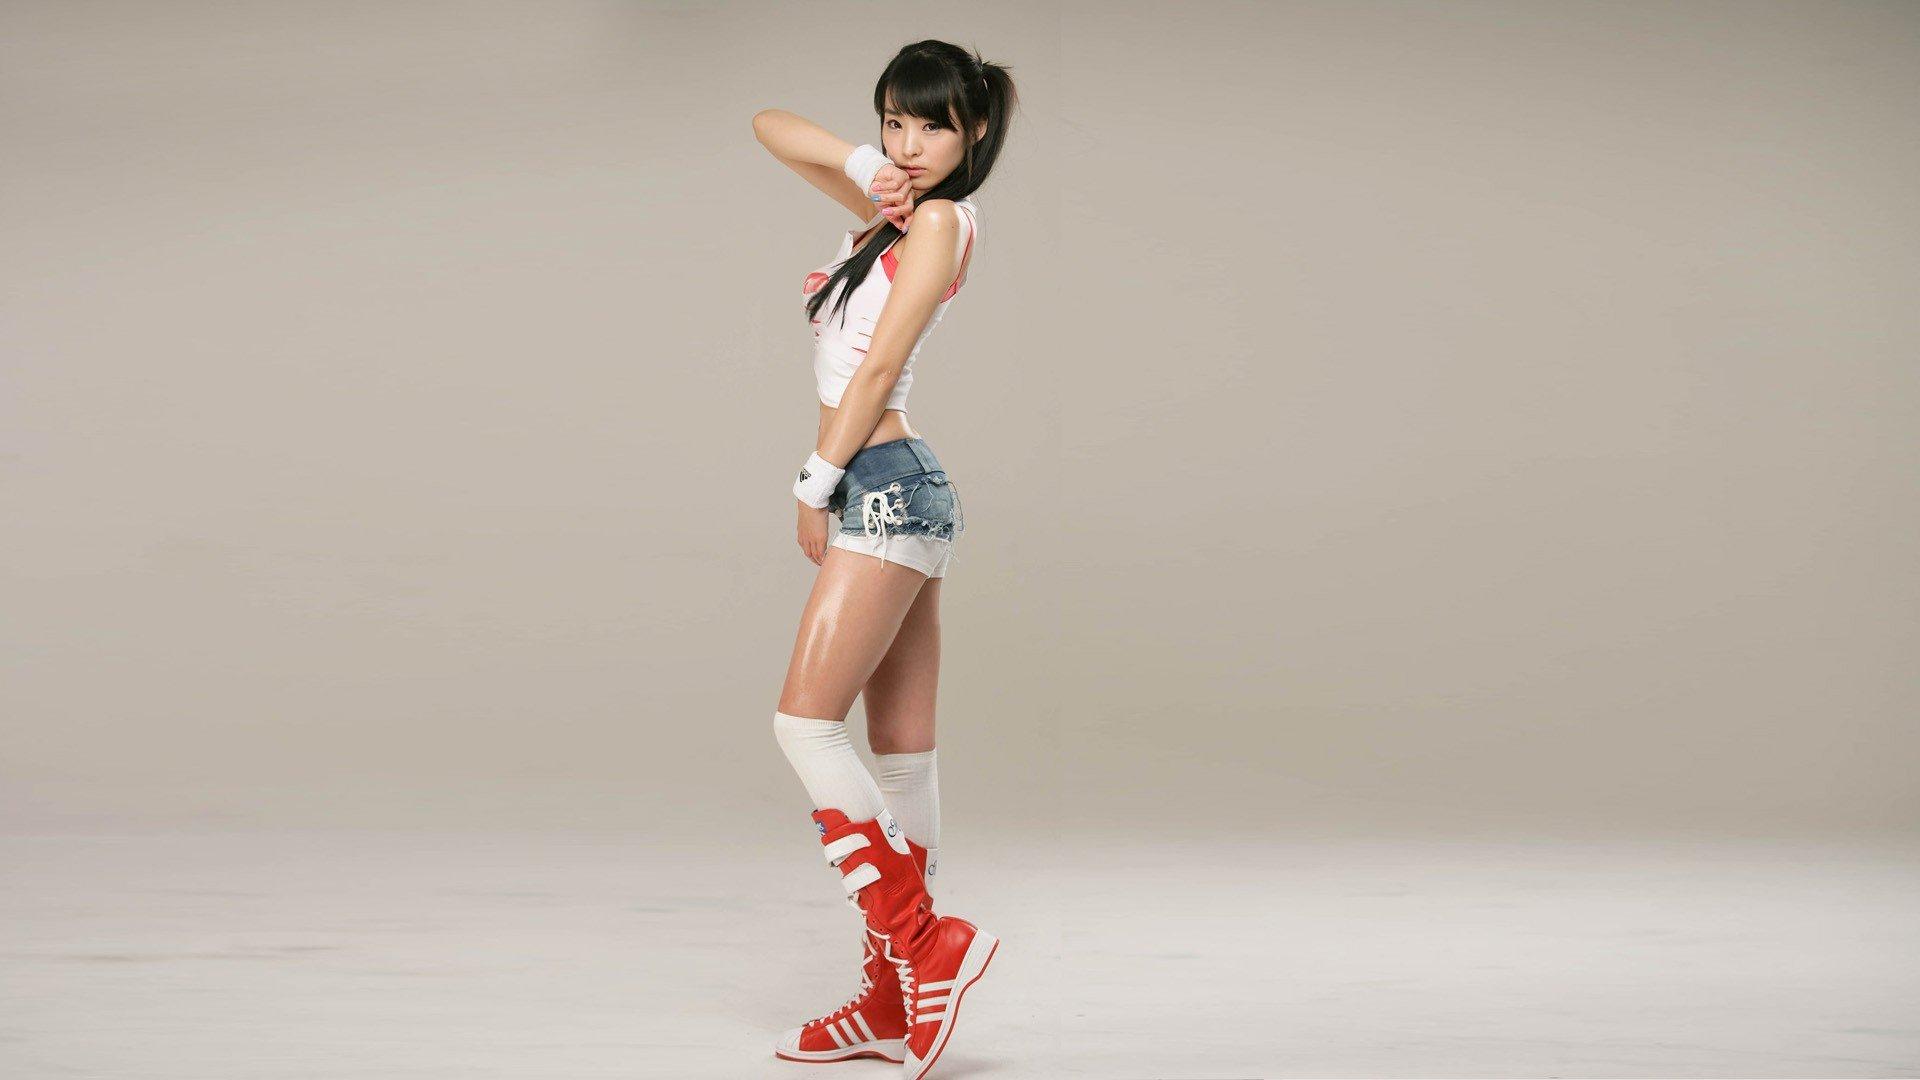 women, Model, Asian, South Korea, Jean shorts Wallpaper